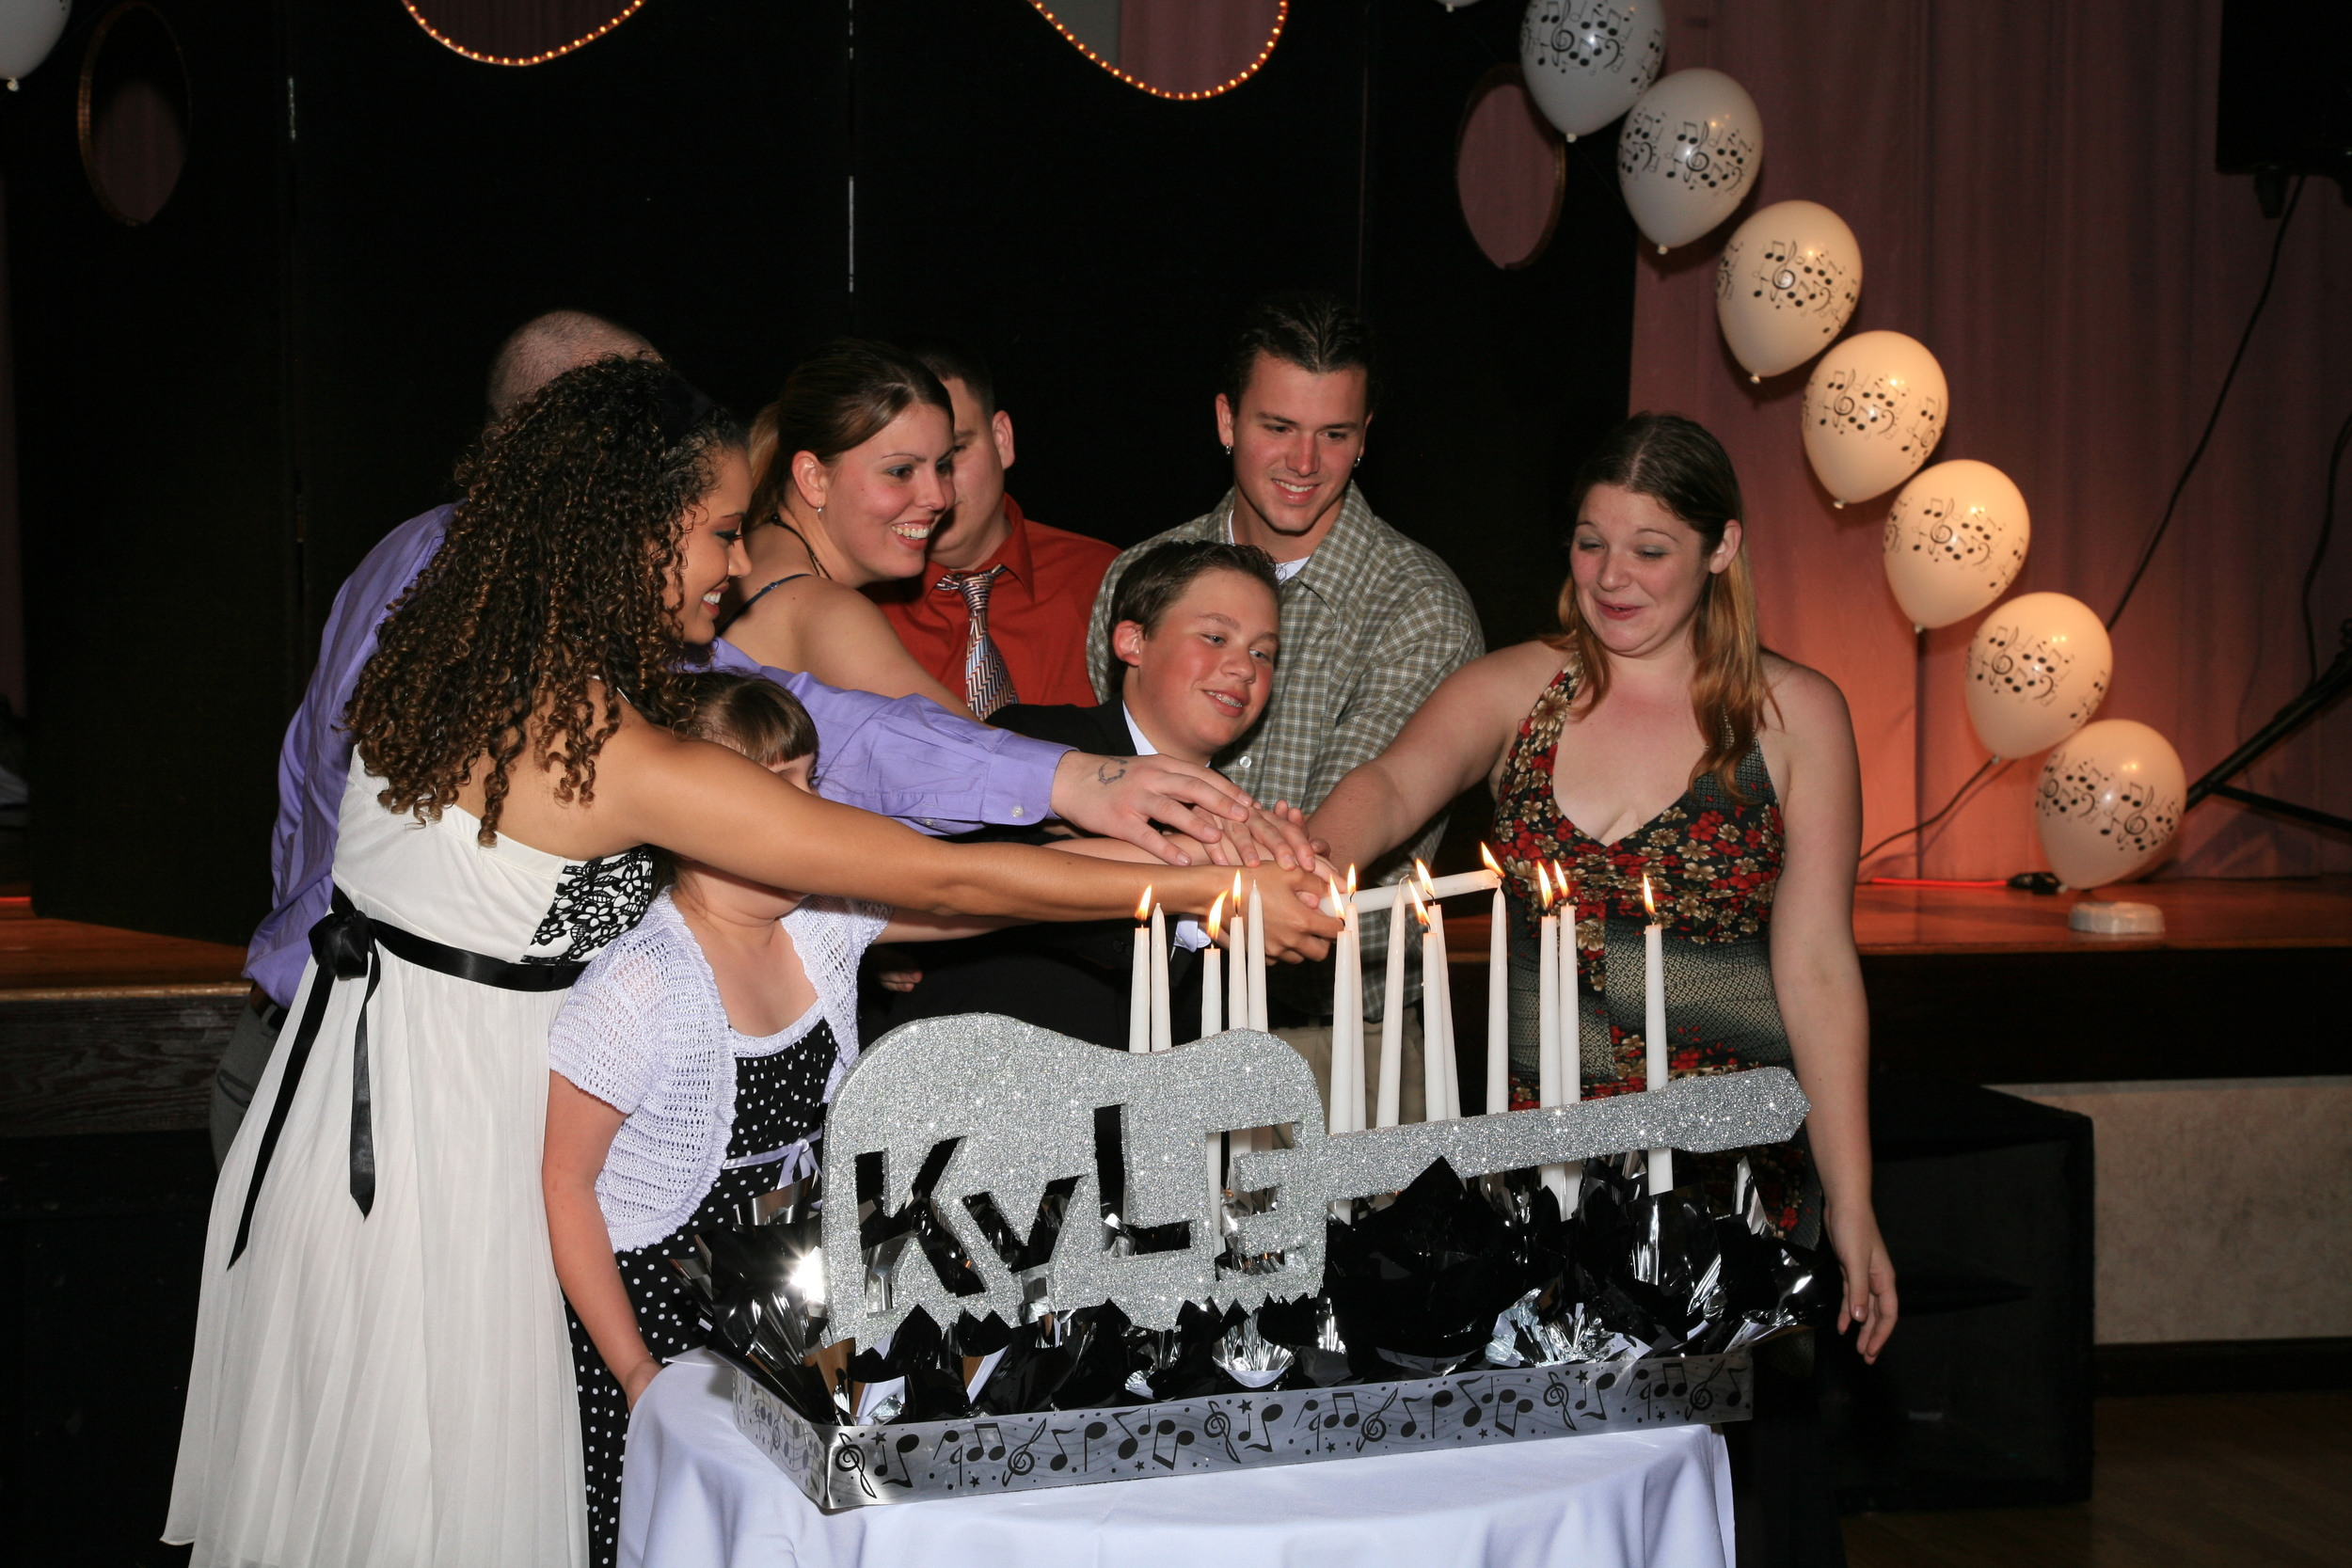 Kyles Bar Mitzvah.JPG